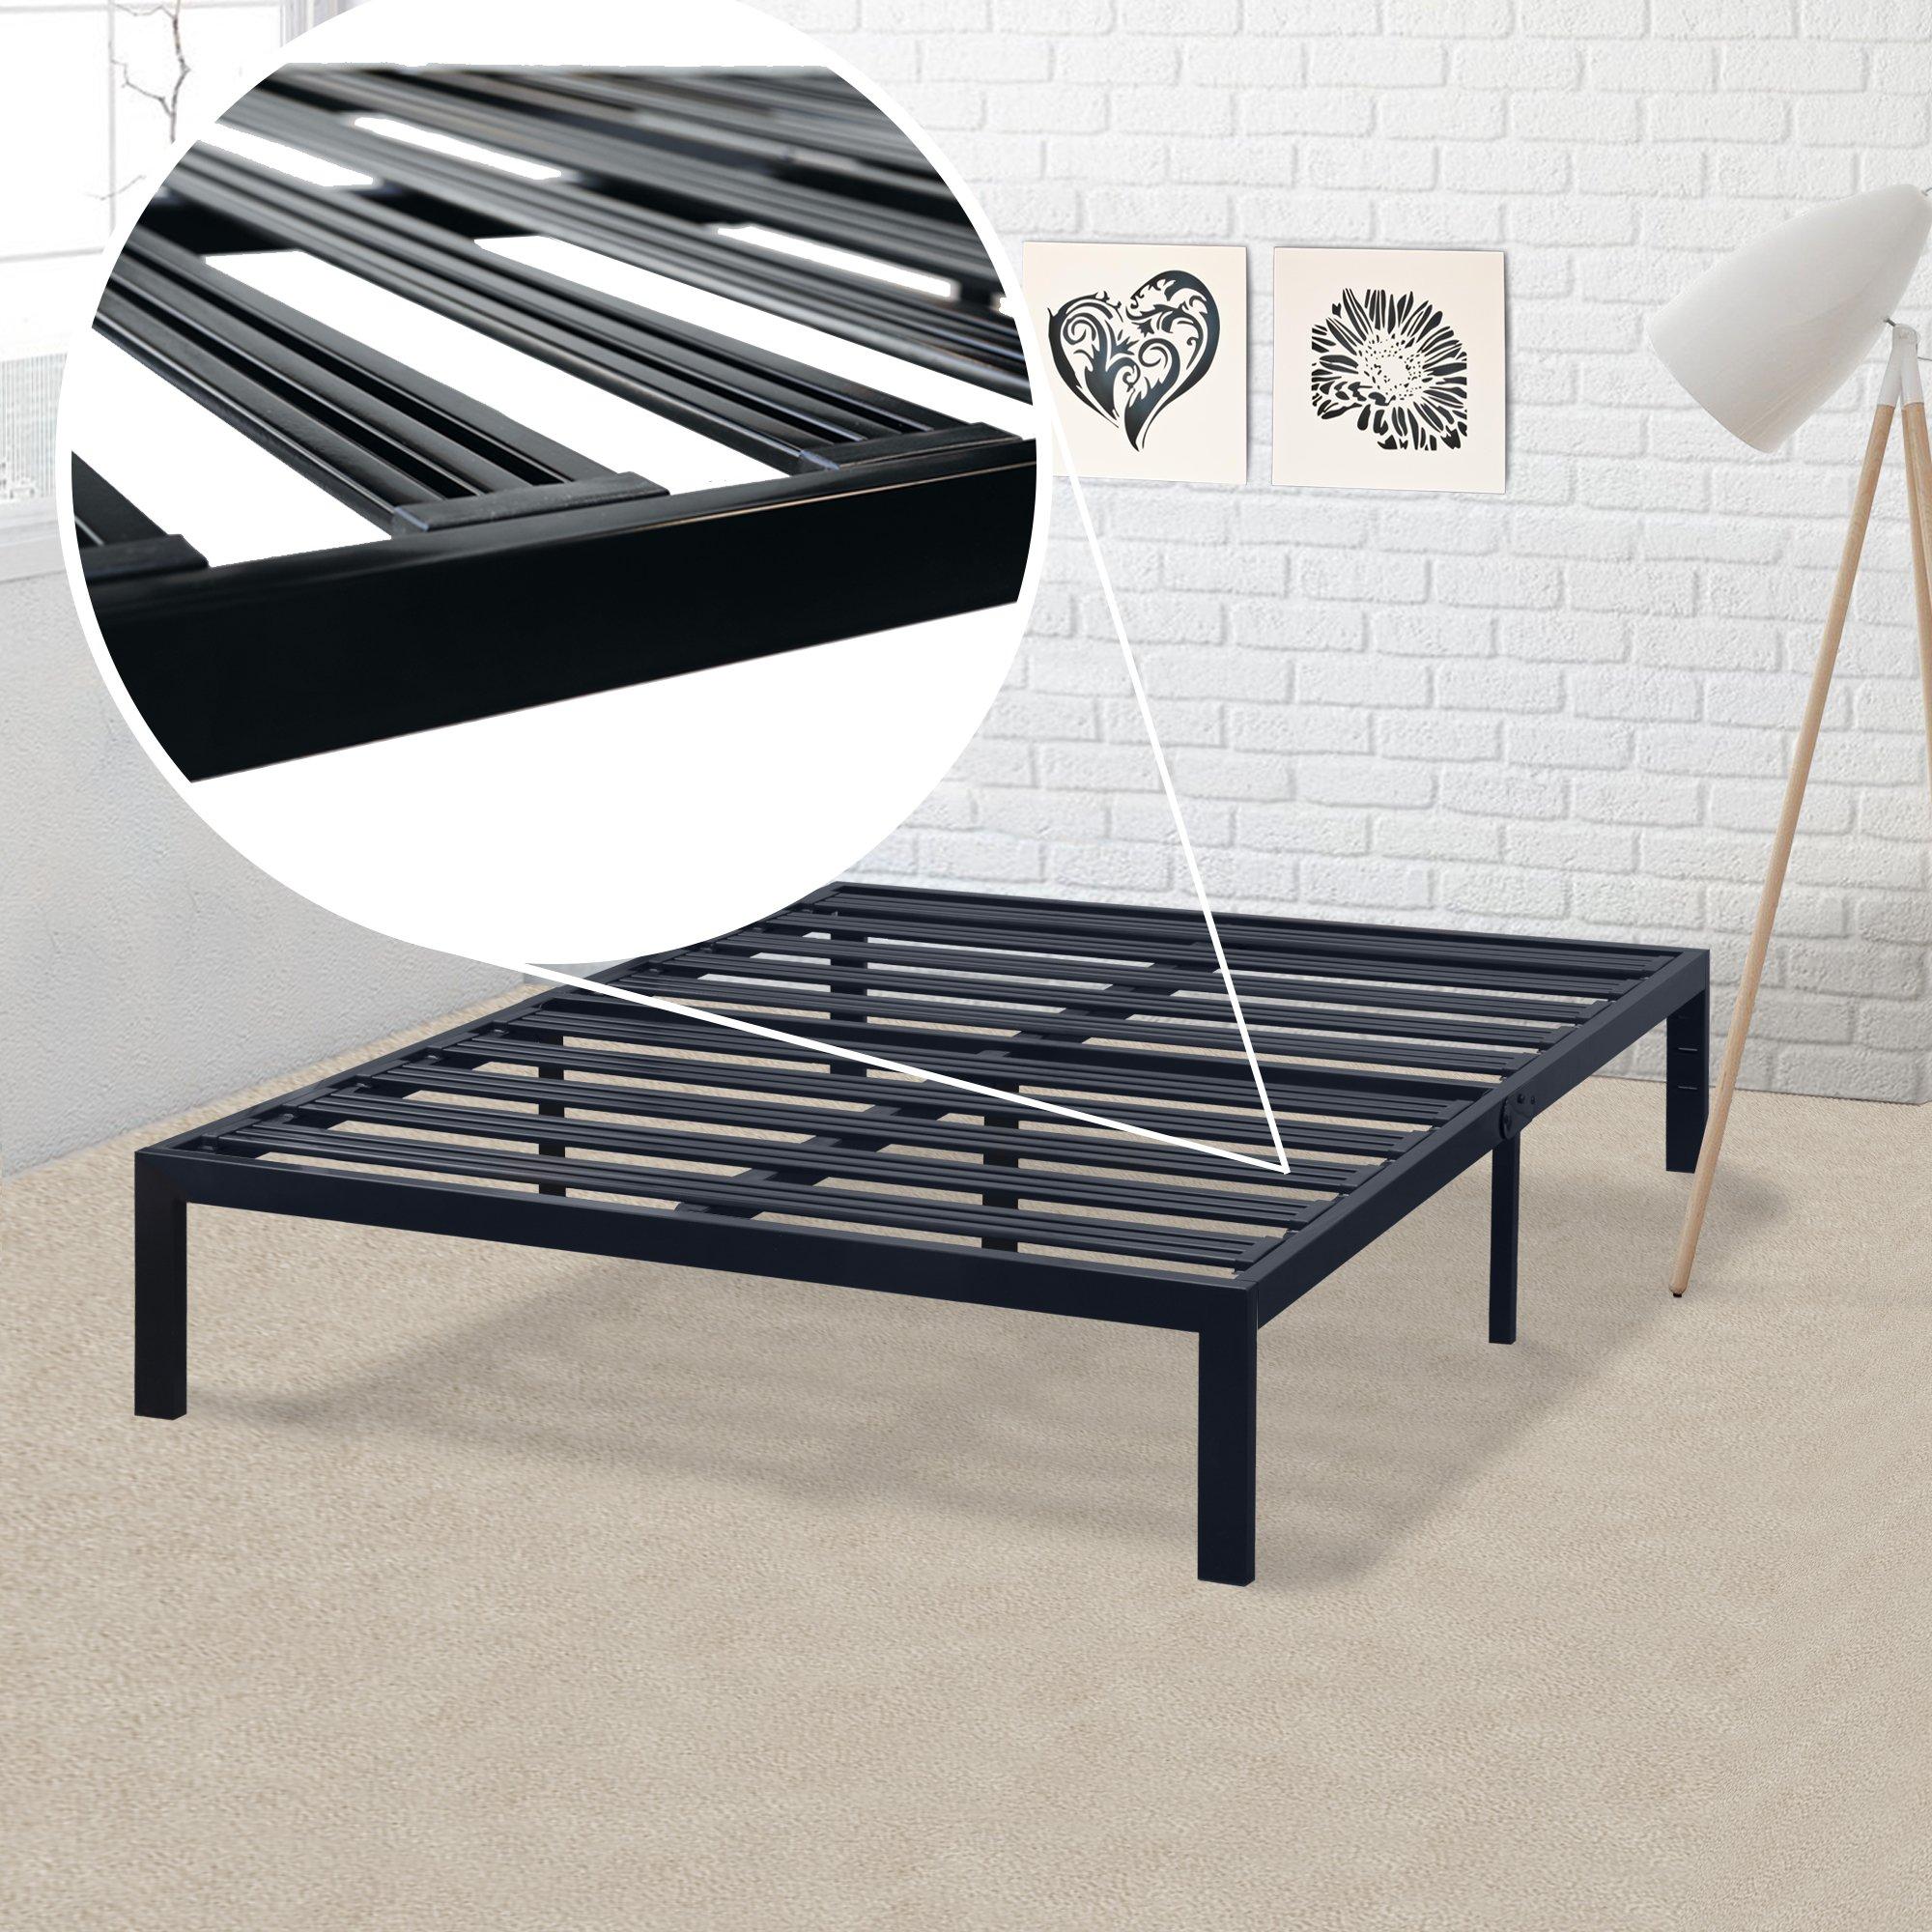 Mellow Rocky Base E 14'' Platform Bed, King, Black by Mellow